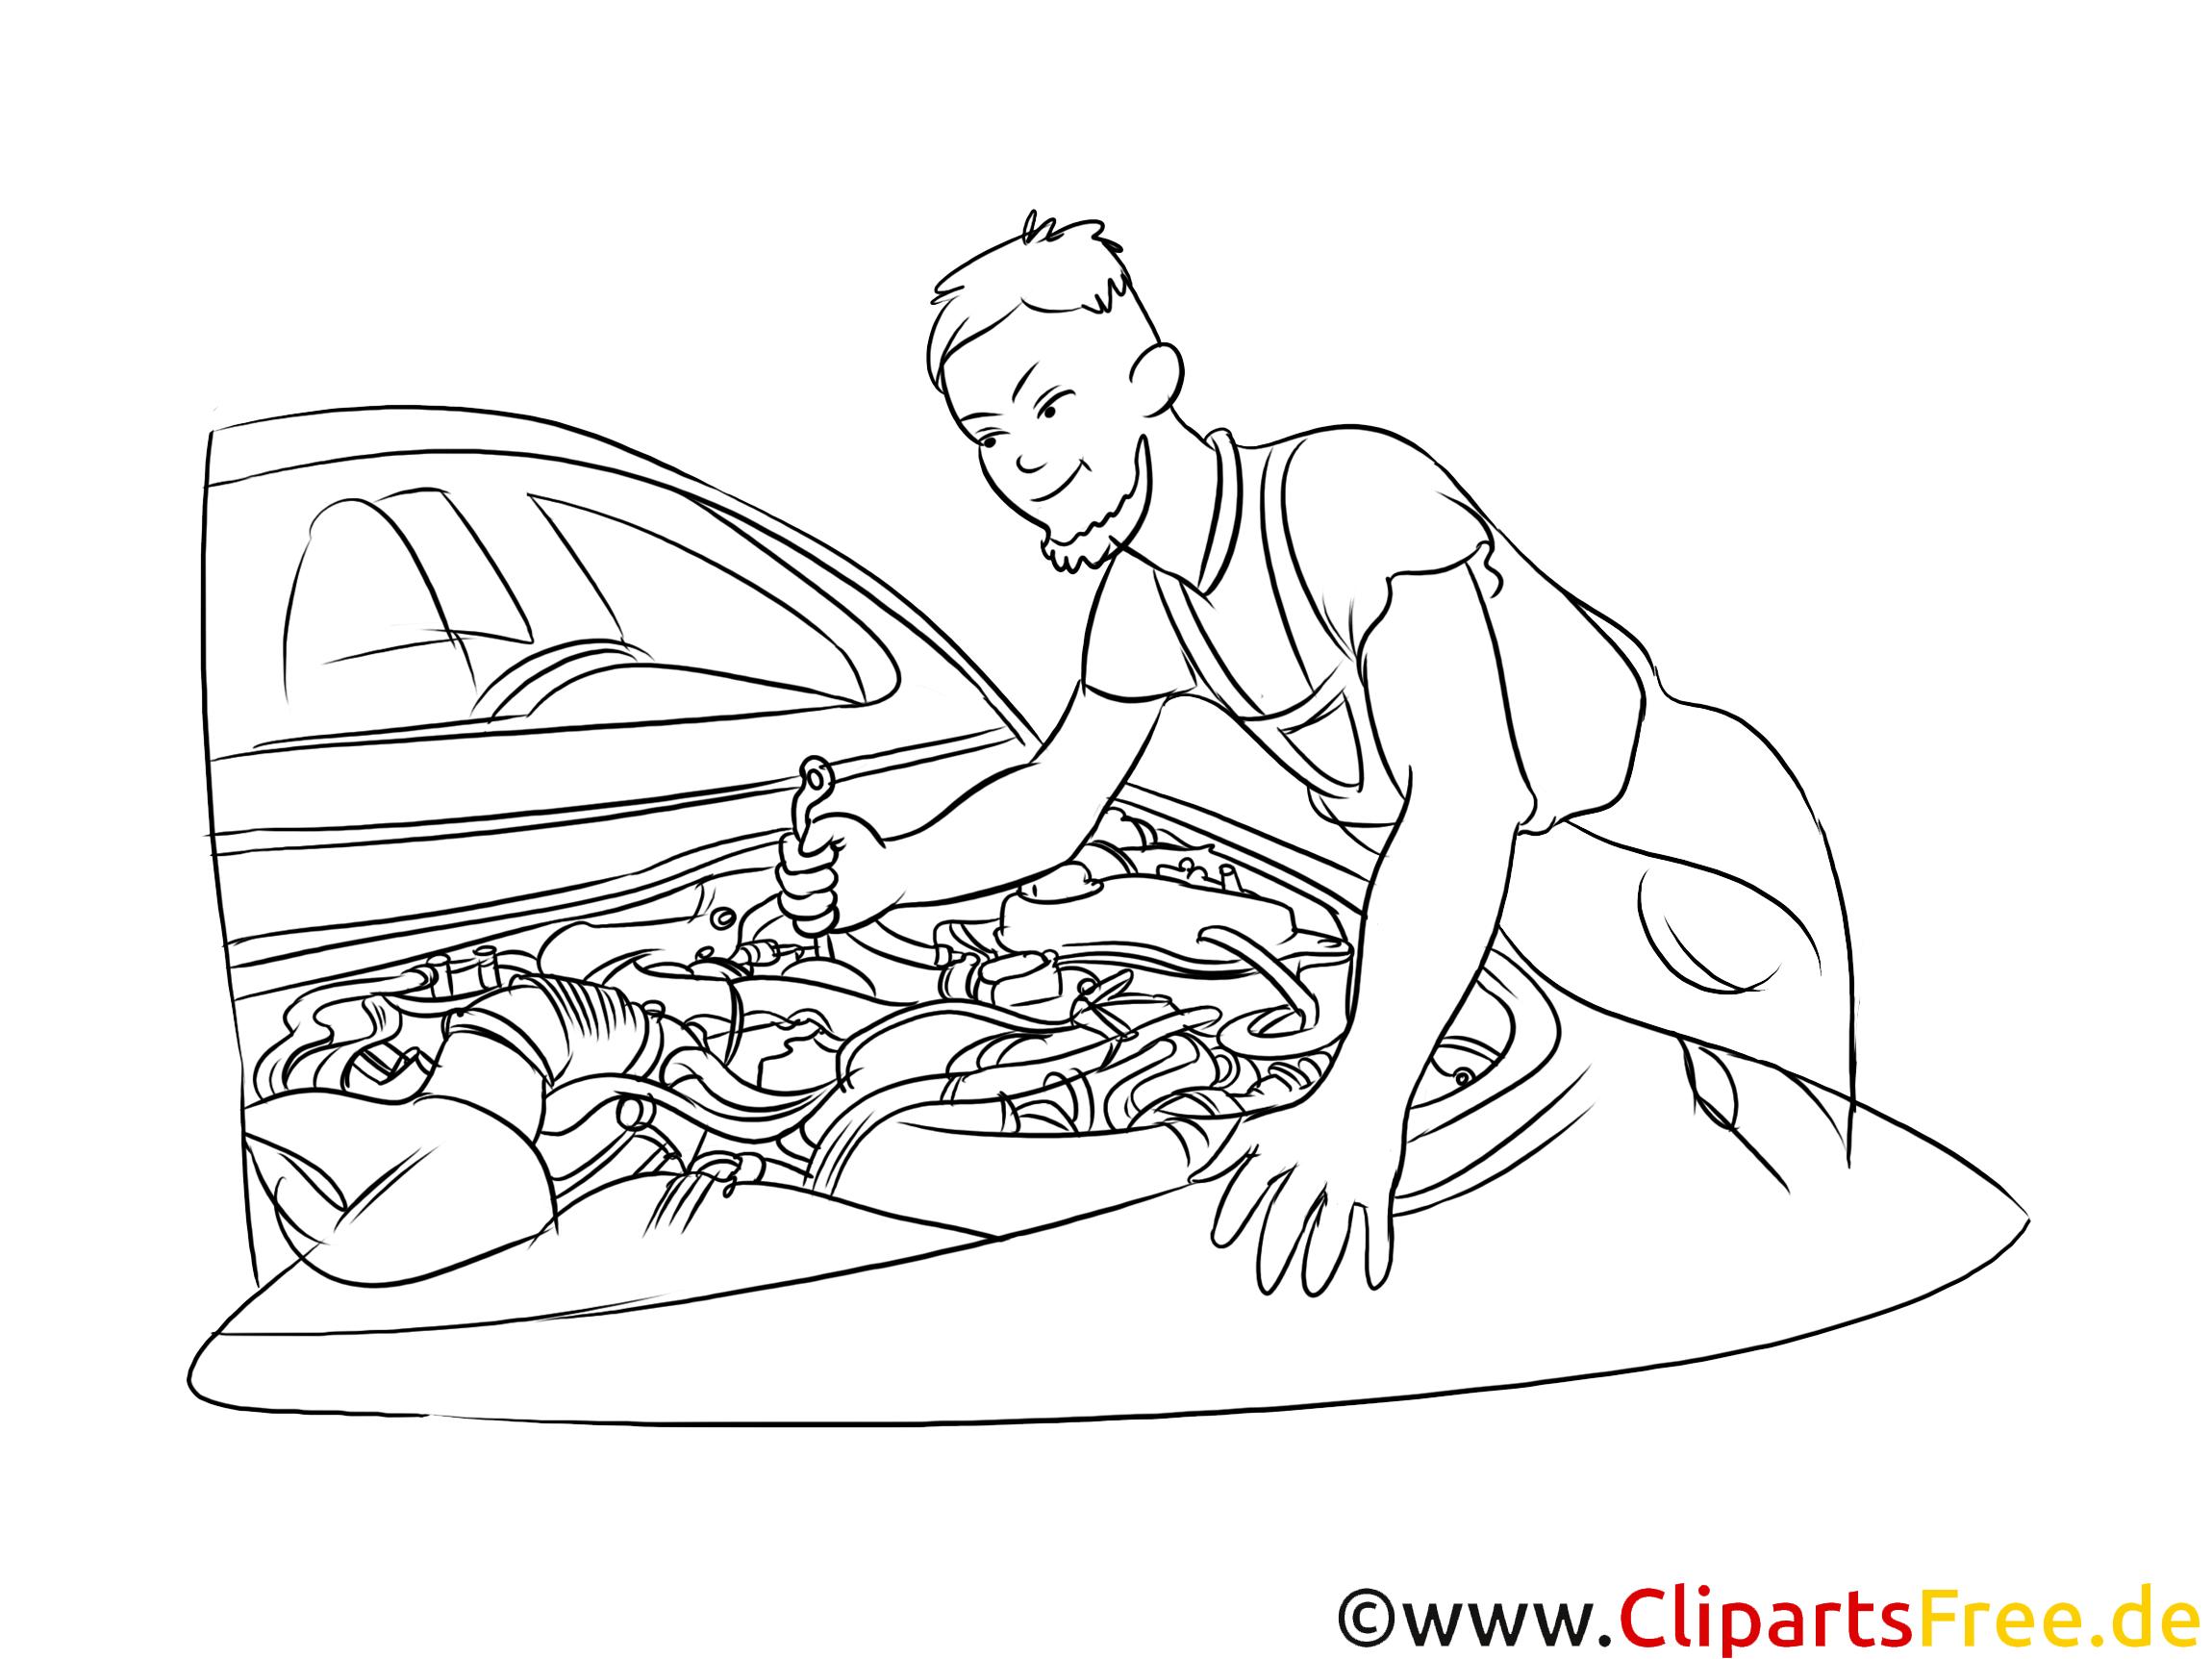 Kfz-Mechaniker Clipart, Grafik, Bild schwarz-weiß